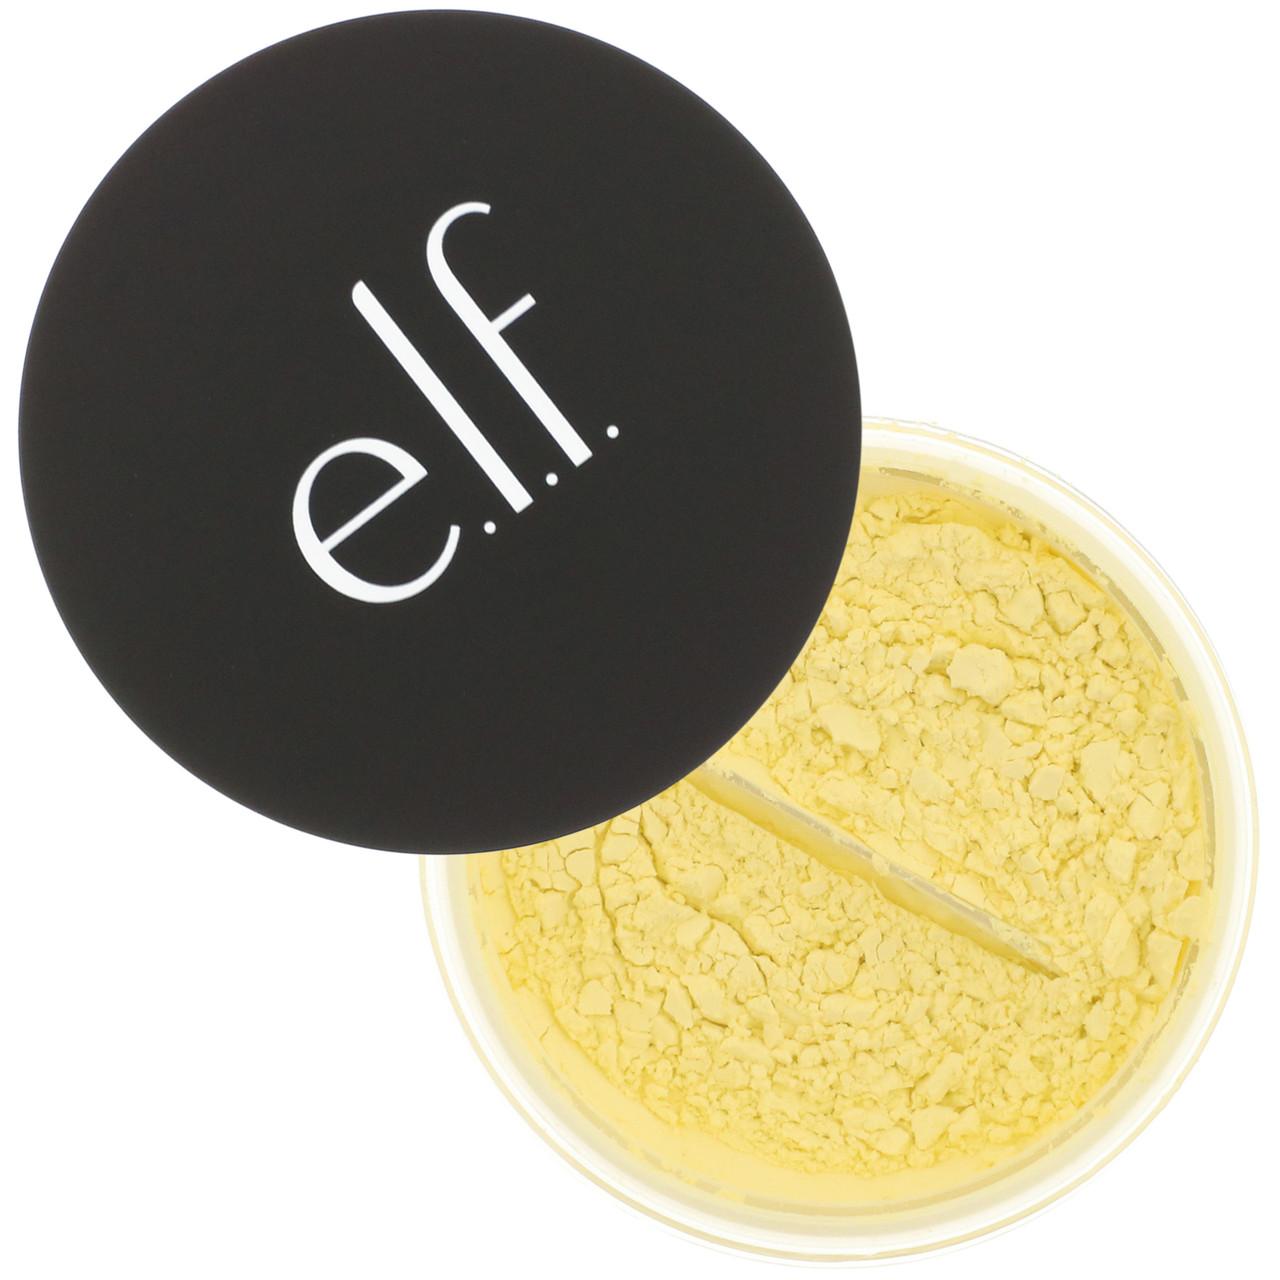 Розсипчаста пудра для обличчя, E. L. F. Cosmetics, коригуюча жовта 8 г